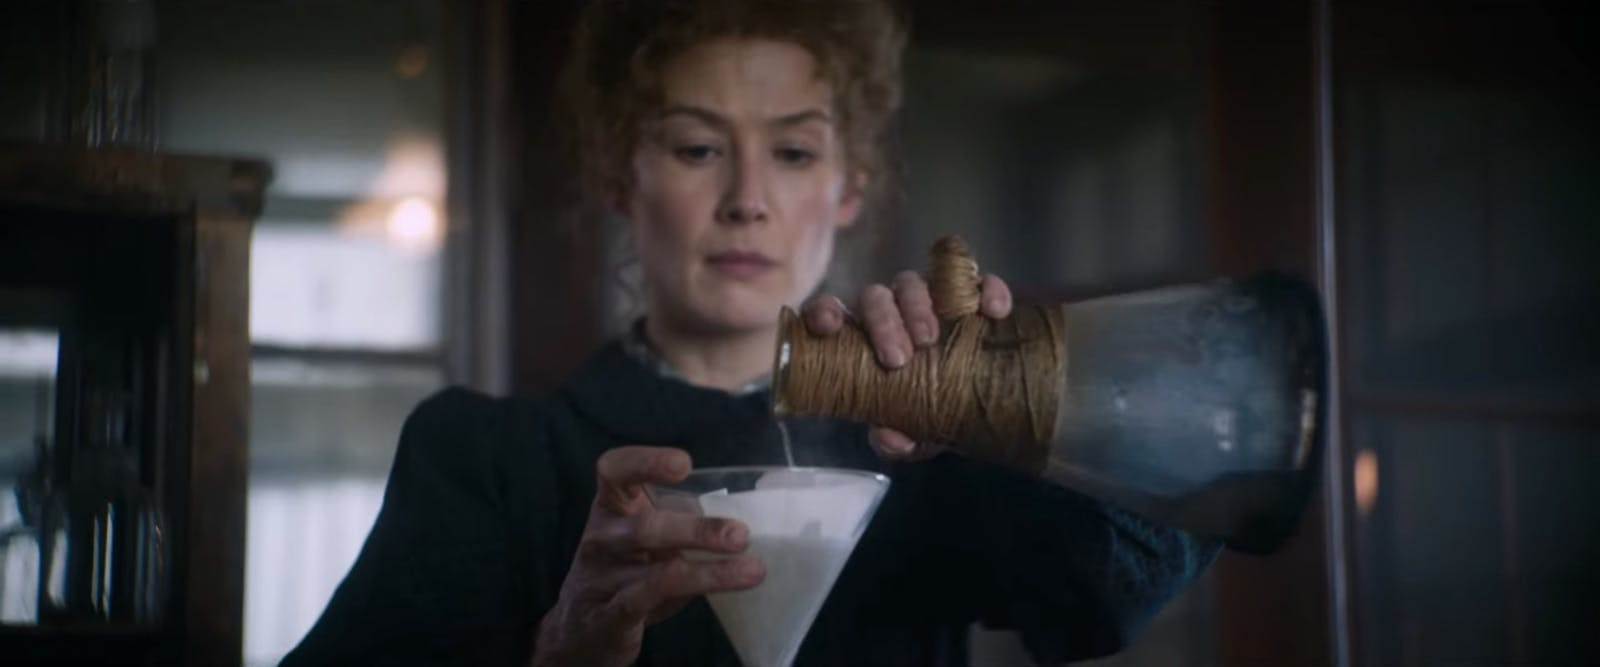 Trailer: Marie Curie med Rosamund Pike